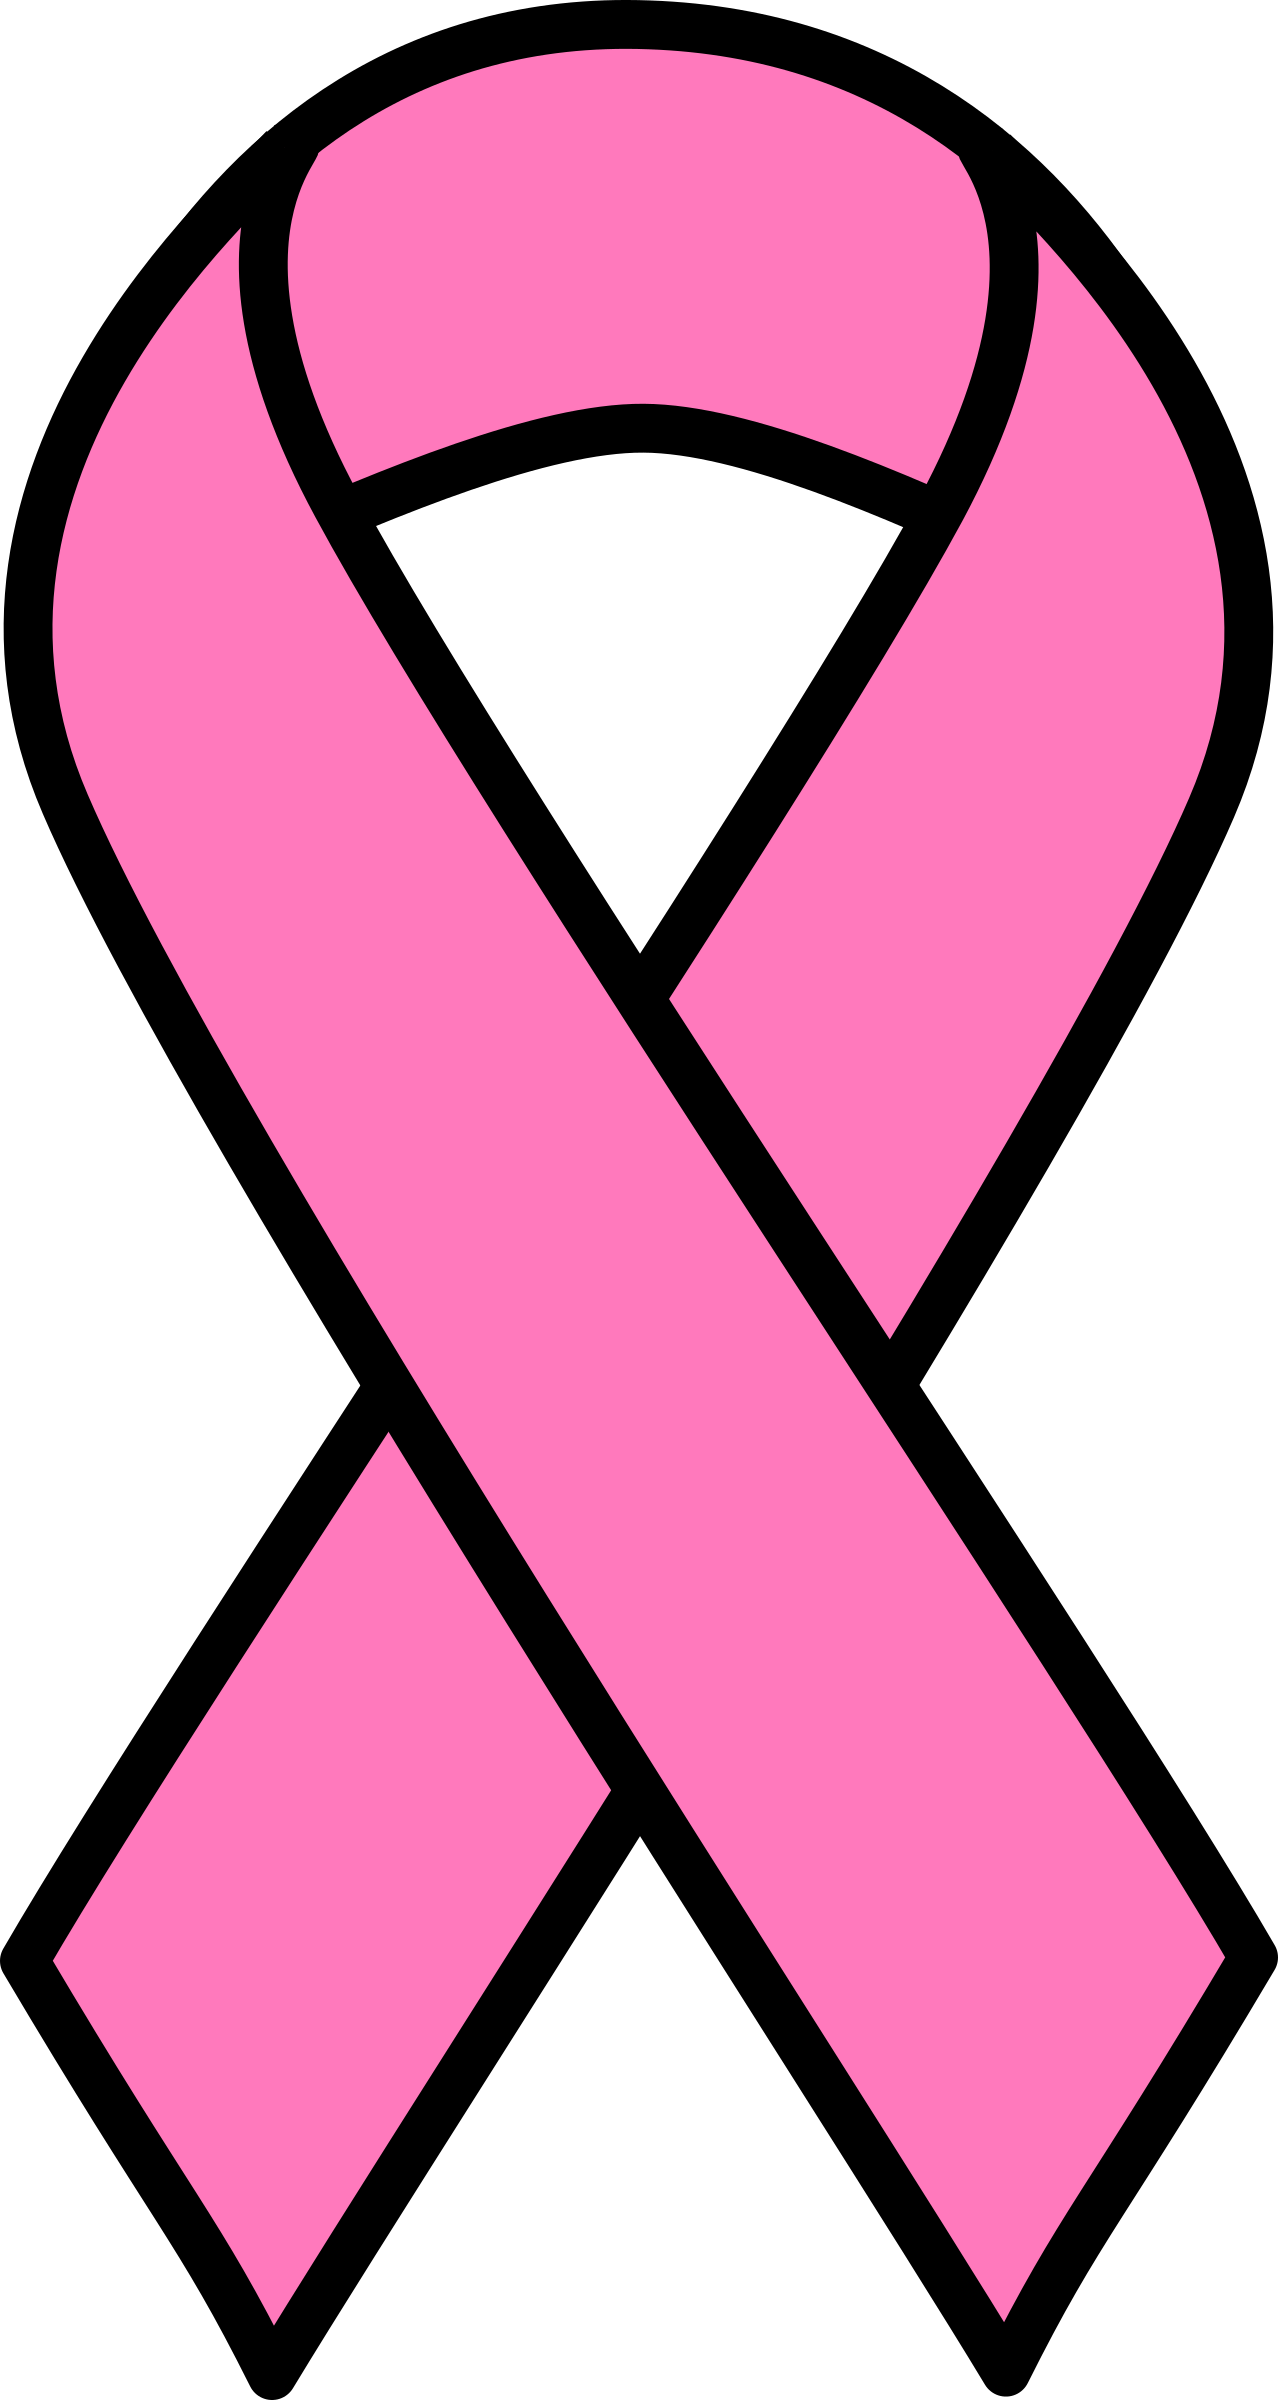 ... Printable Breast Cancer Ribbon Clipa-... Printable breast cancer ribbon clipart 2 clipartall - Cliparting clipartall.com ...-13